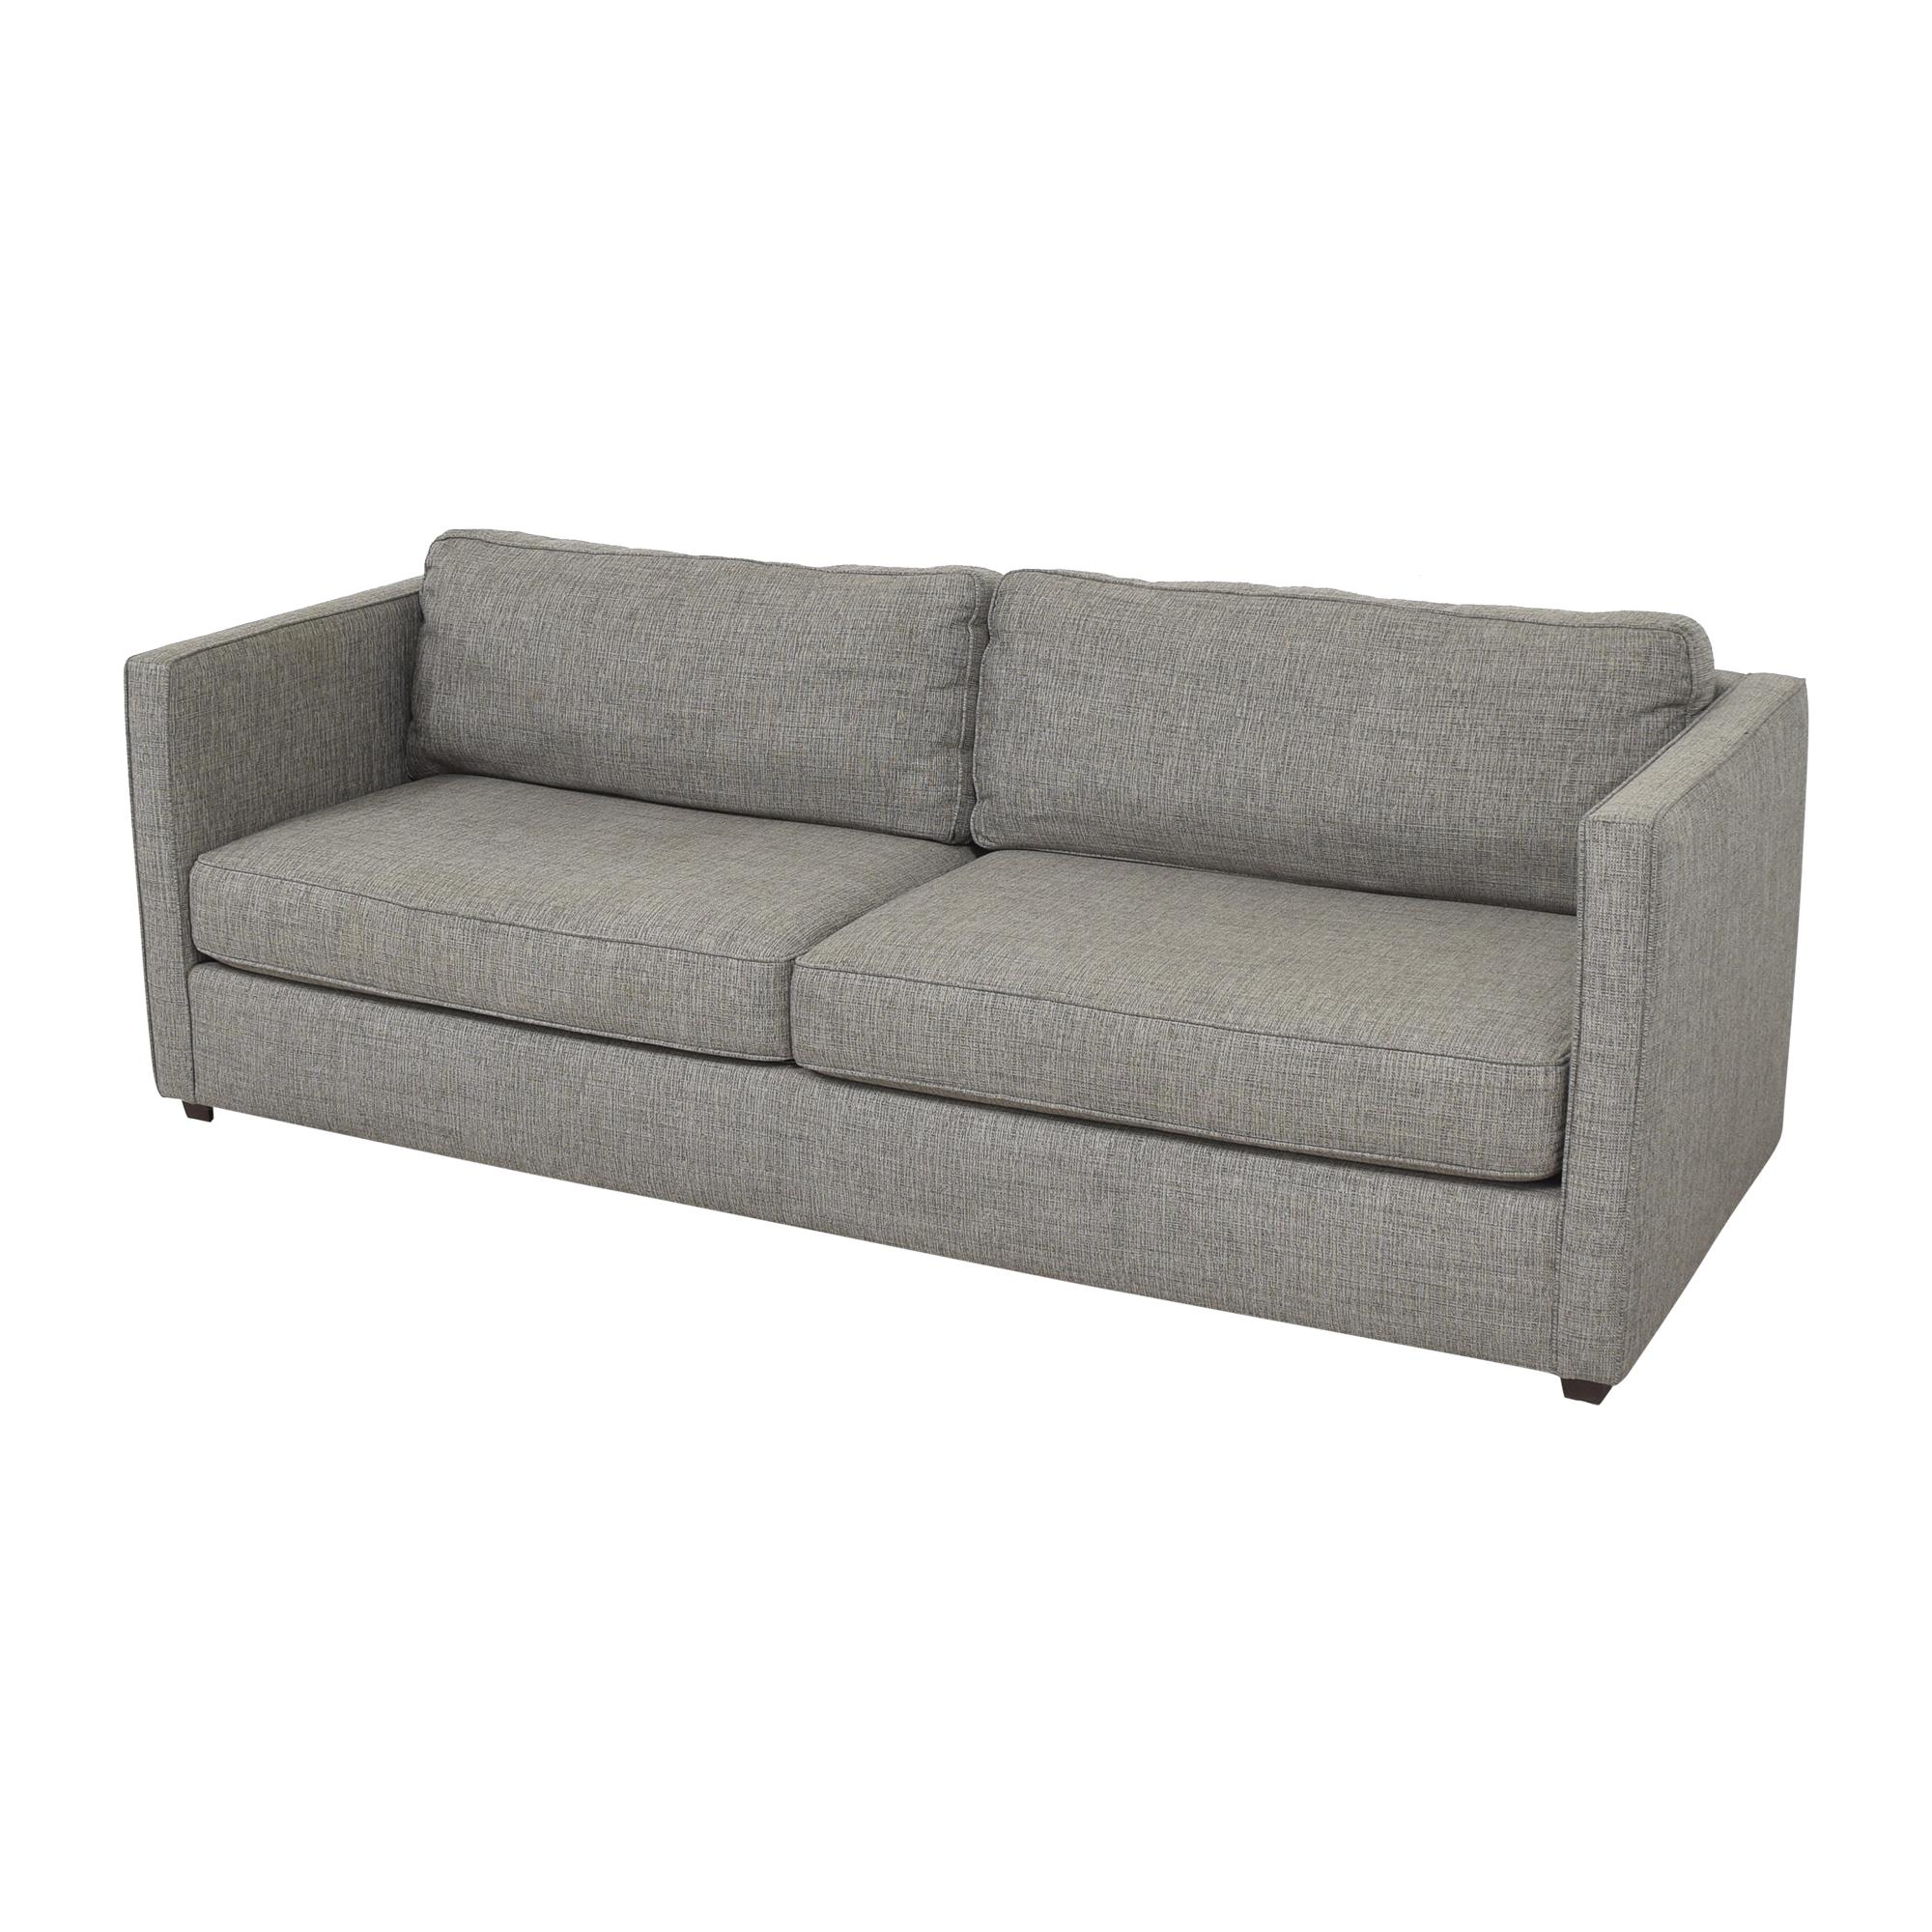 Room & Board Room & Board Watson Two Cushion Sofa price